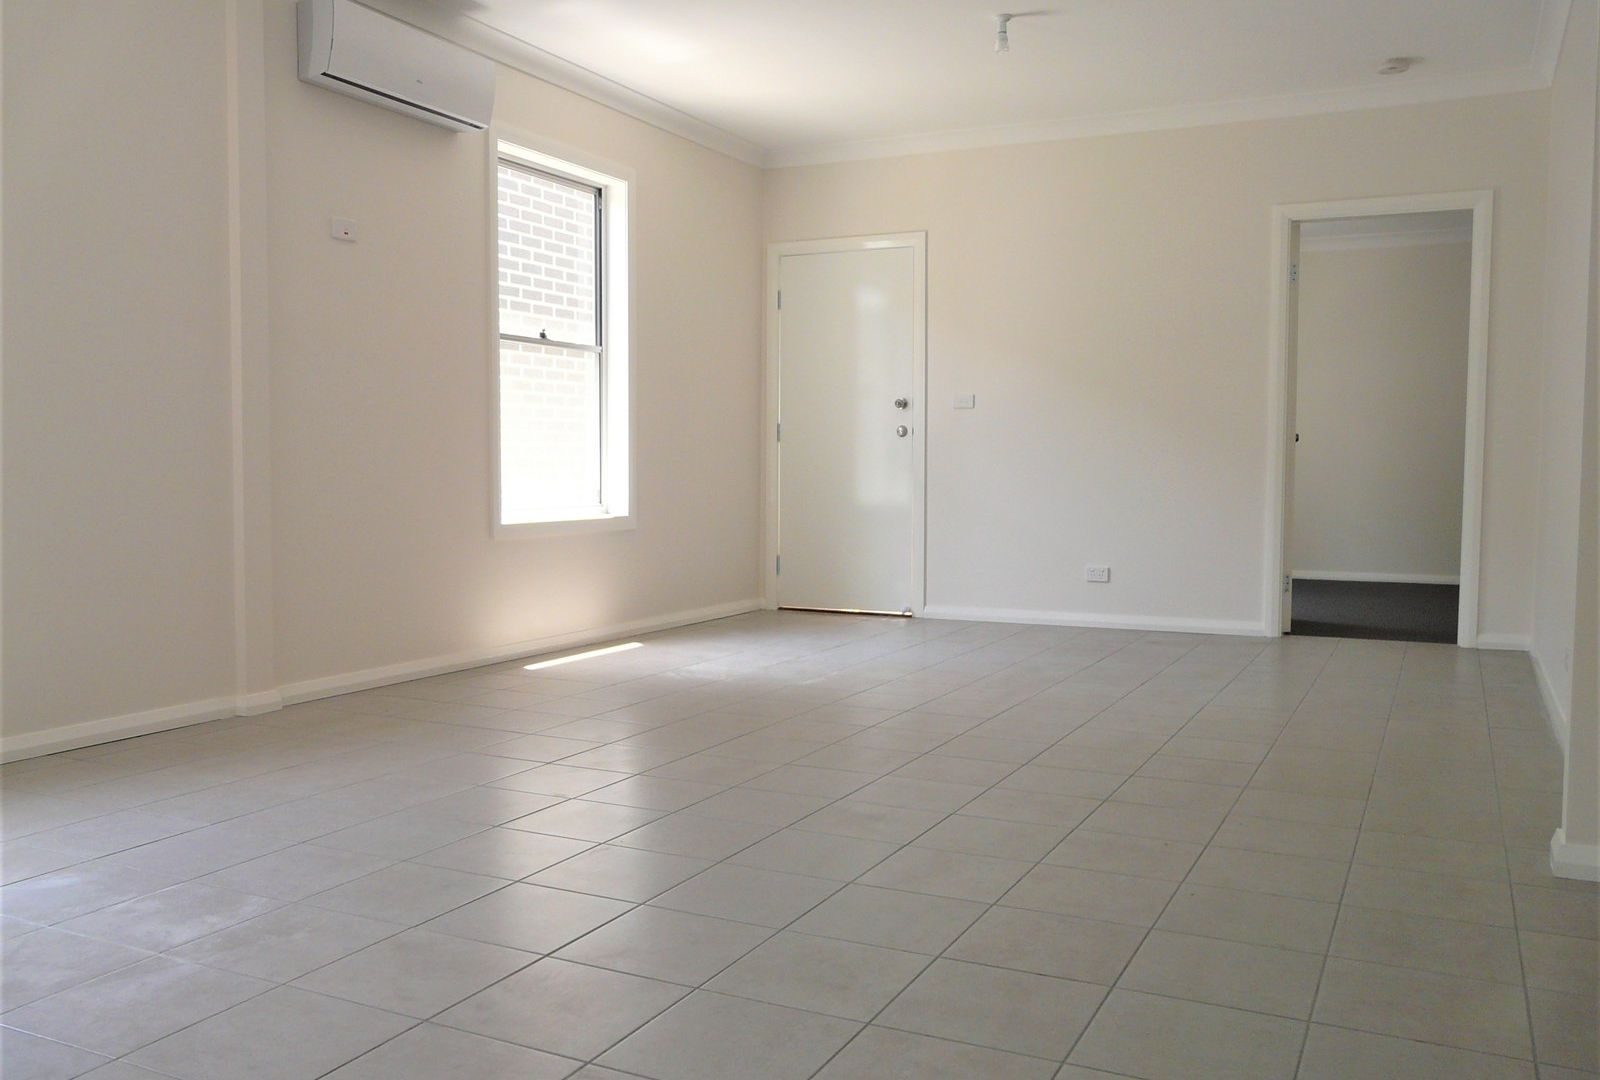 2/15 Howe Street, Lambton NSW 2299, Image 1